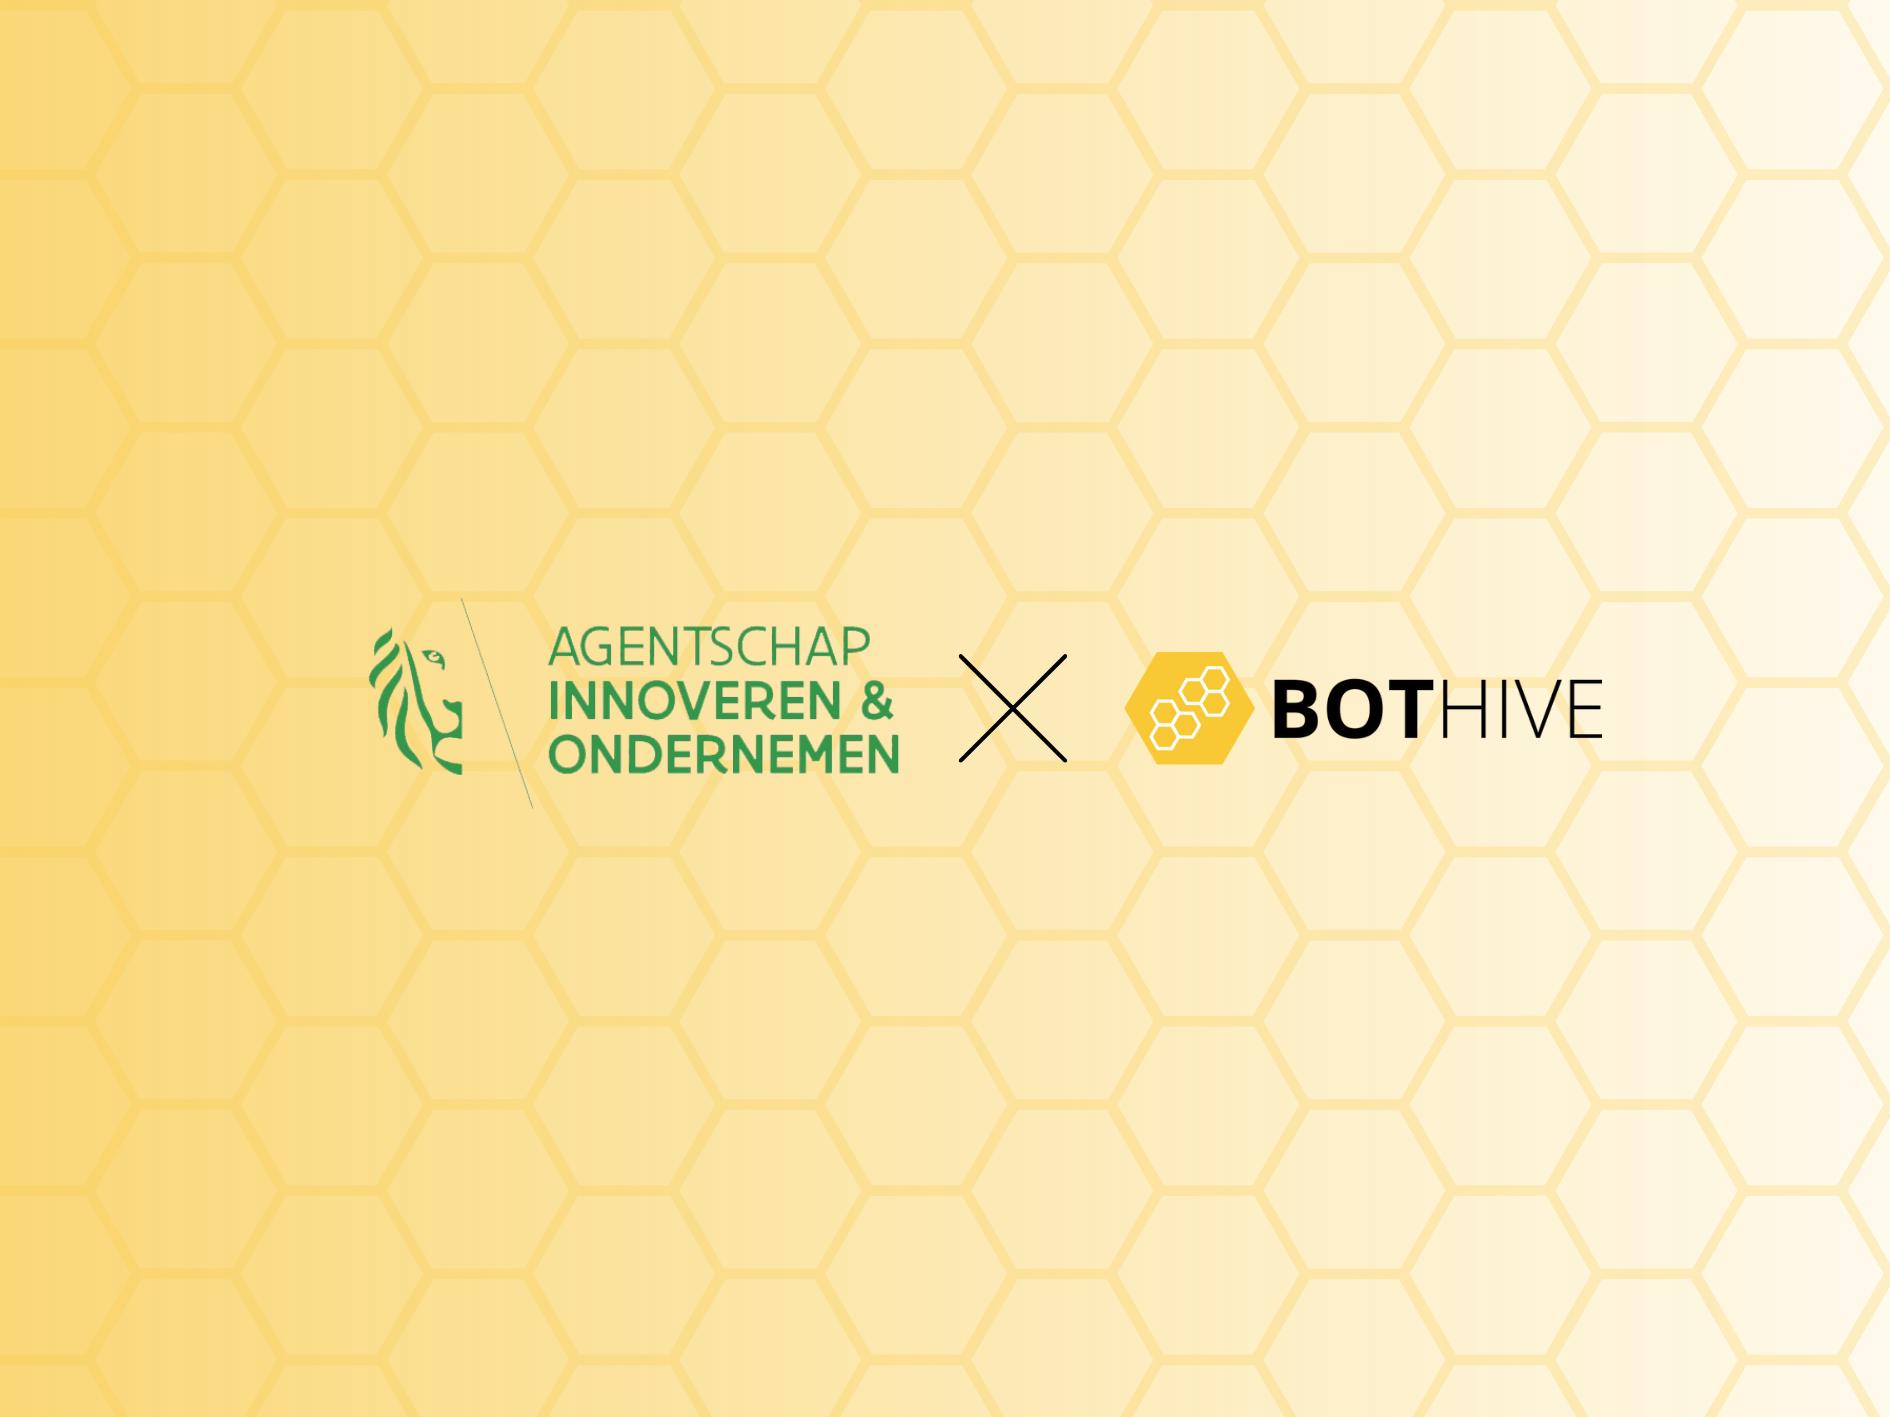 Bothive | Bothive en VLAIO bouwen chatbot voor startende ondernemers